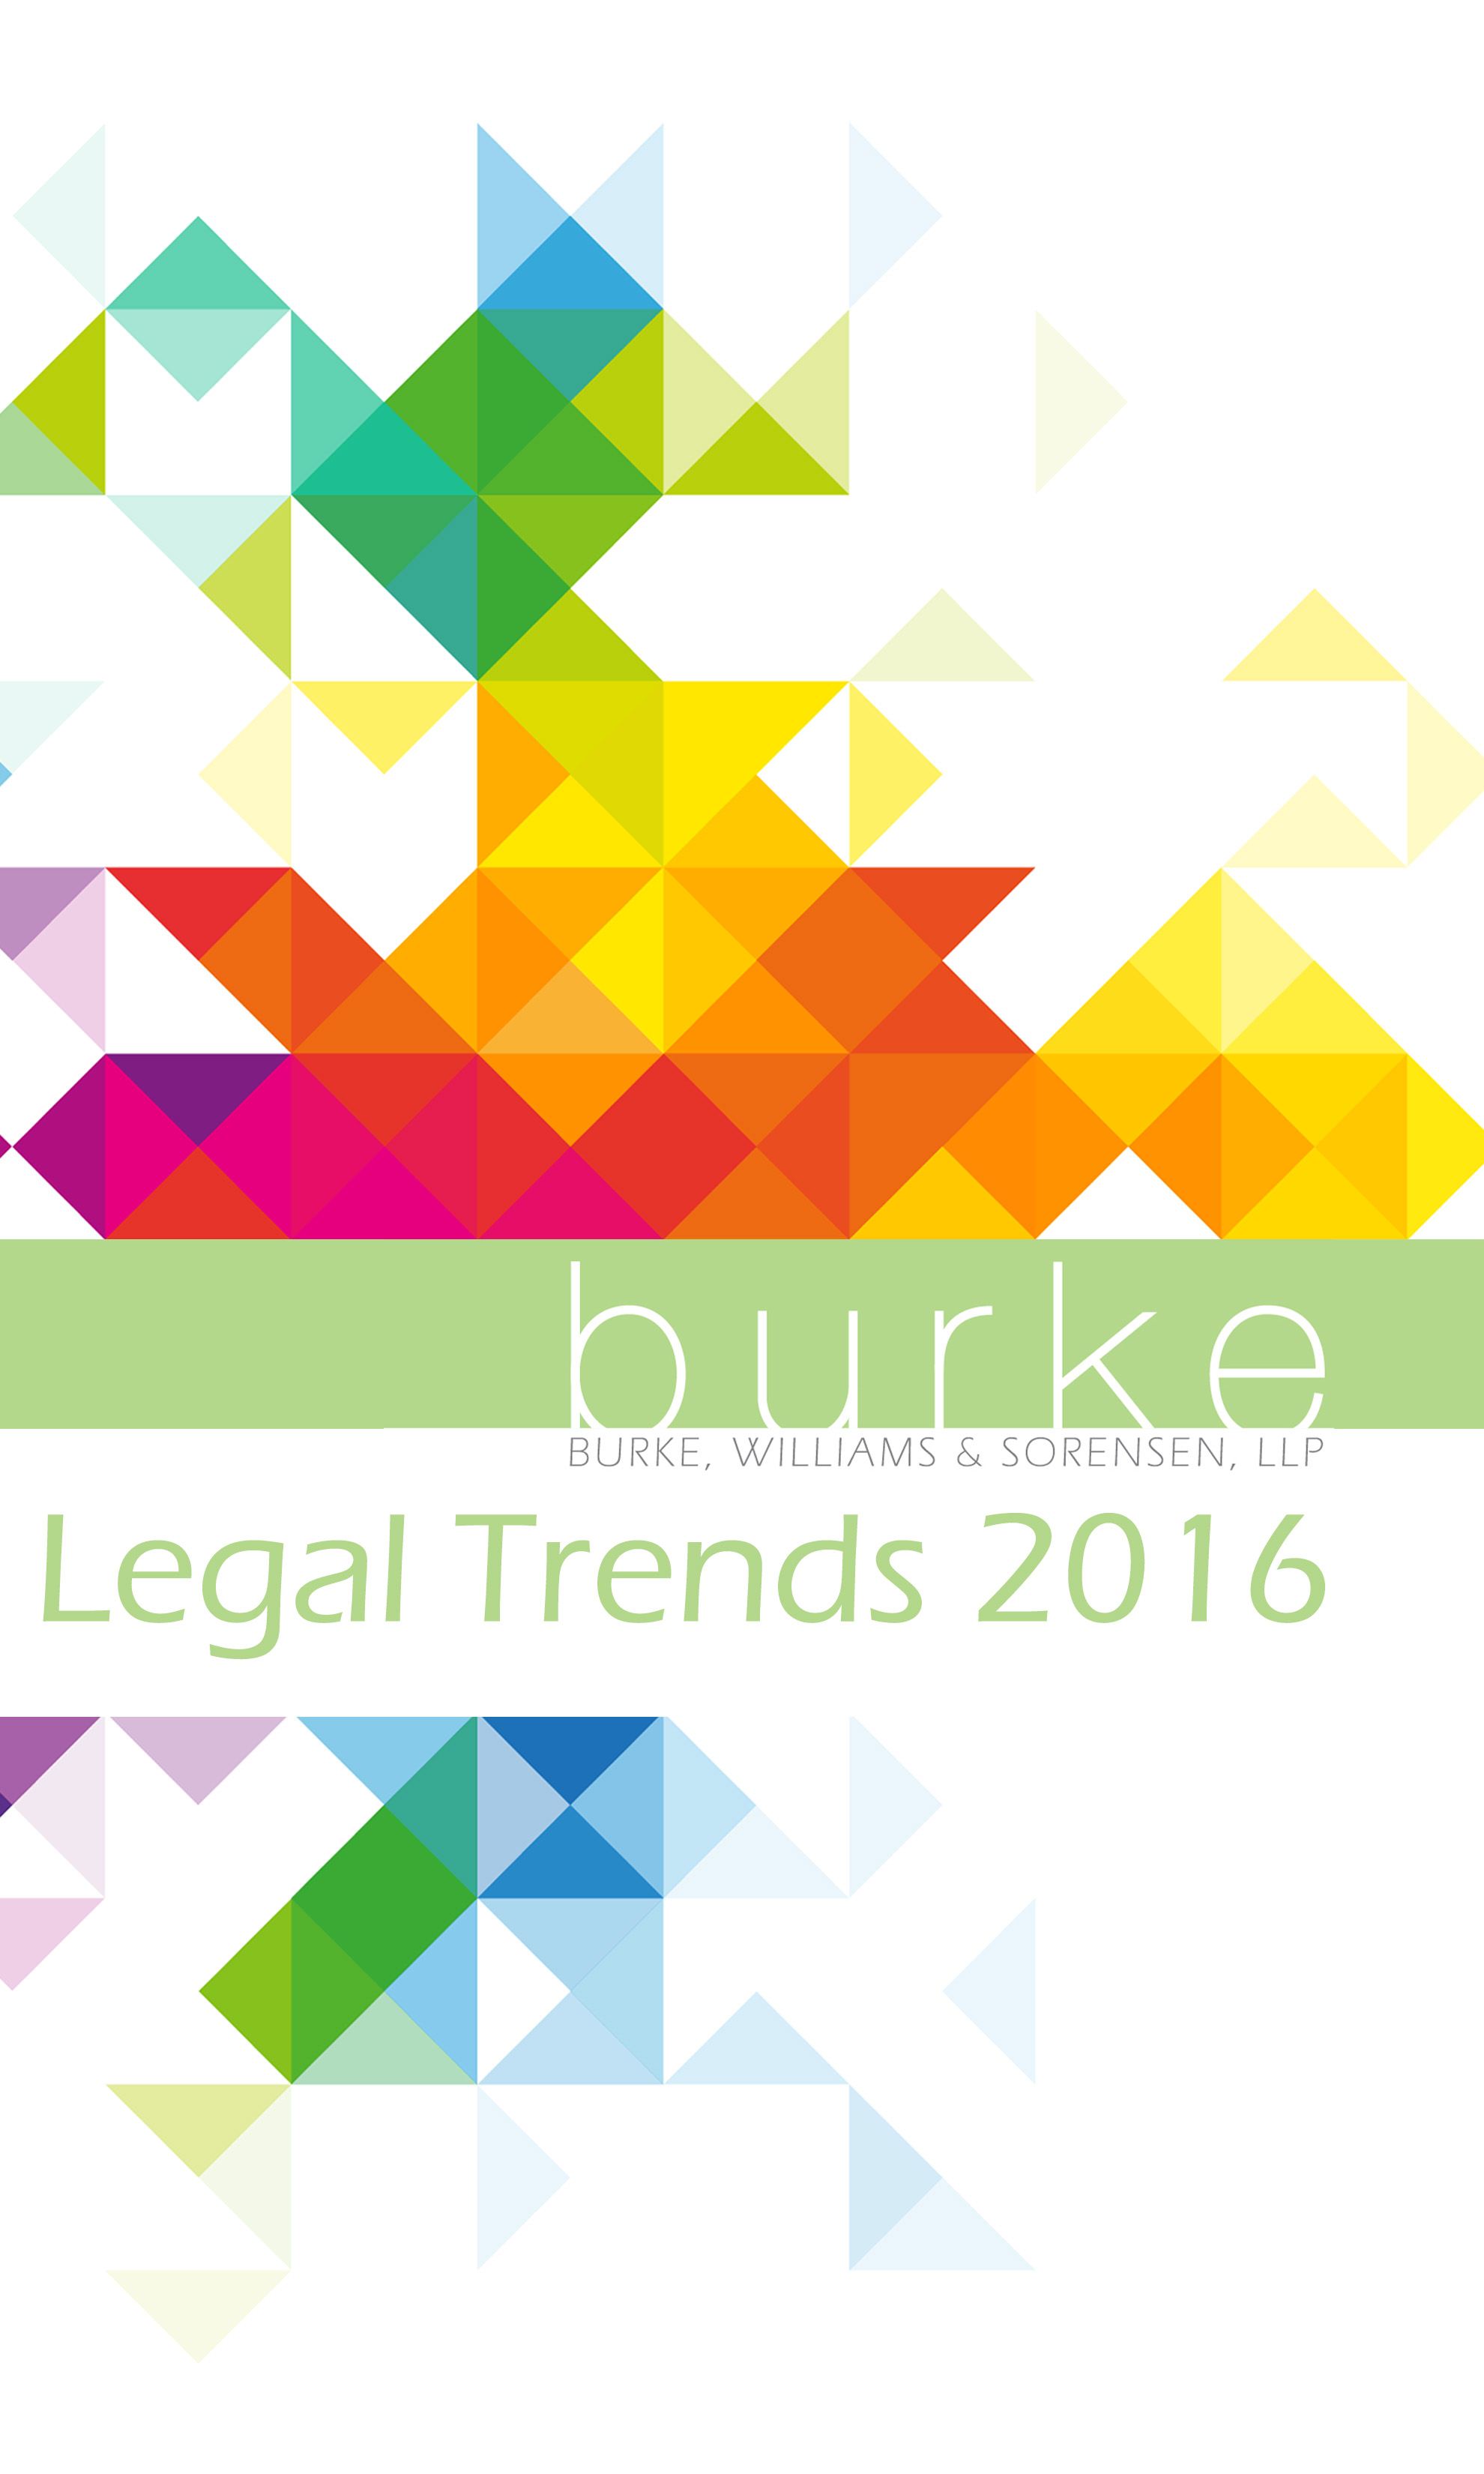 2016 Legal Trends | Burke, Williams & Sorensen, LLP